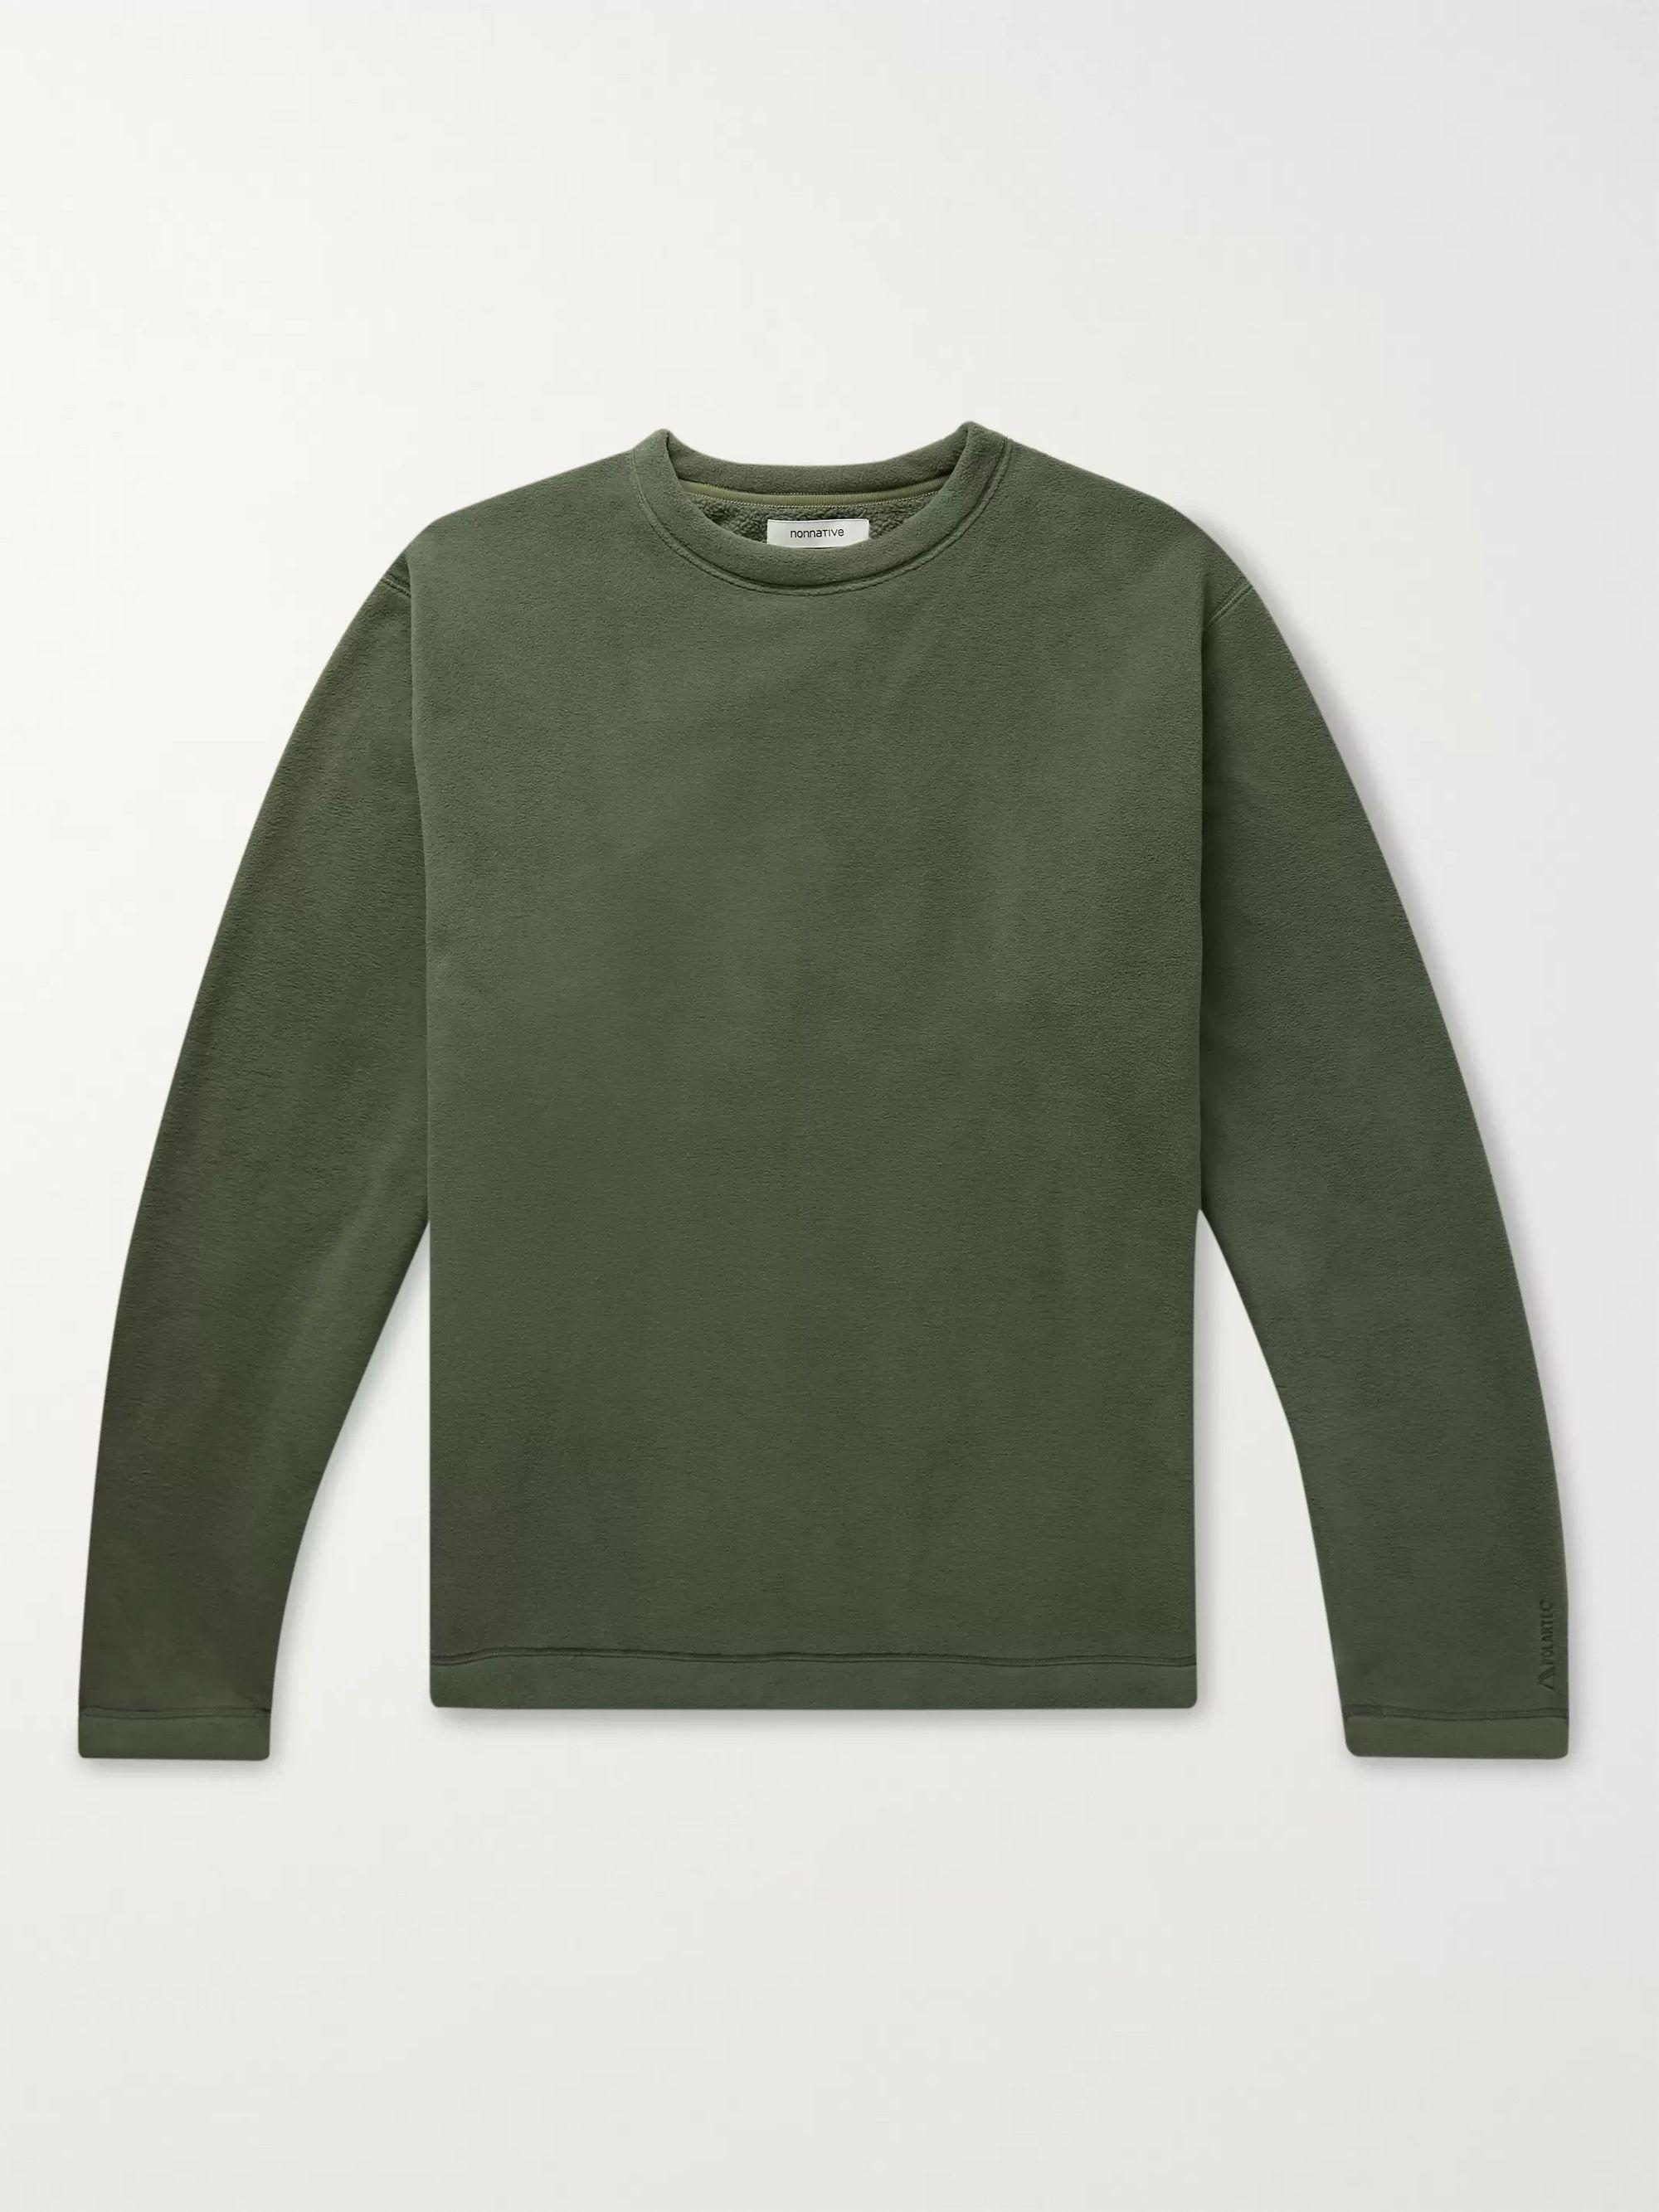 Coach Shell Trimmed Polartec Fleece Sweatshirt by Nonnative